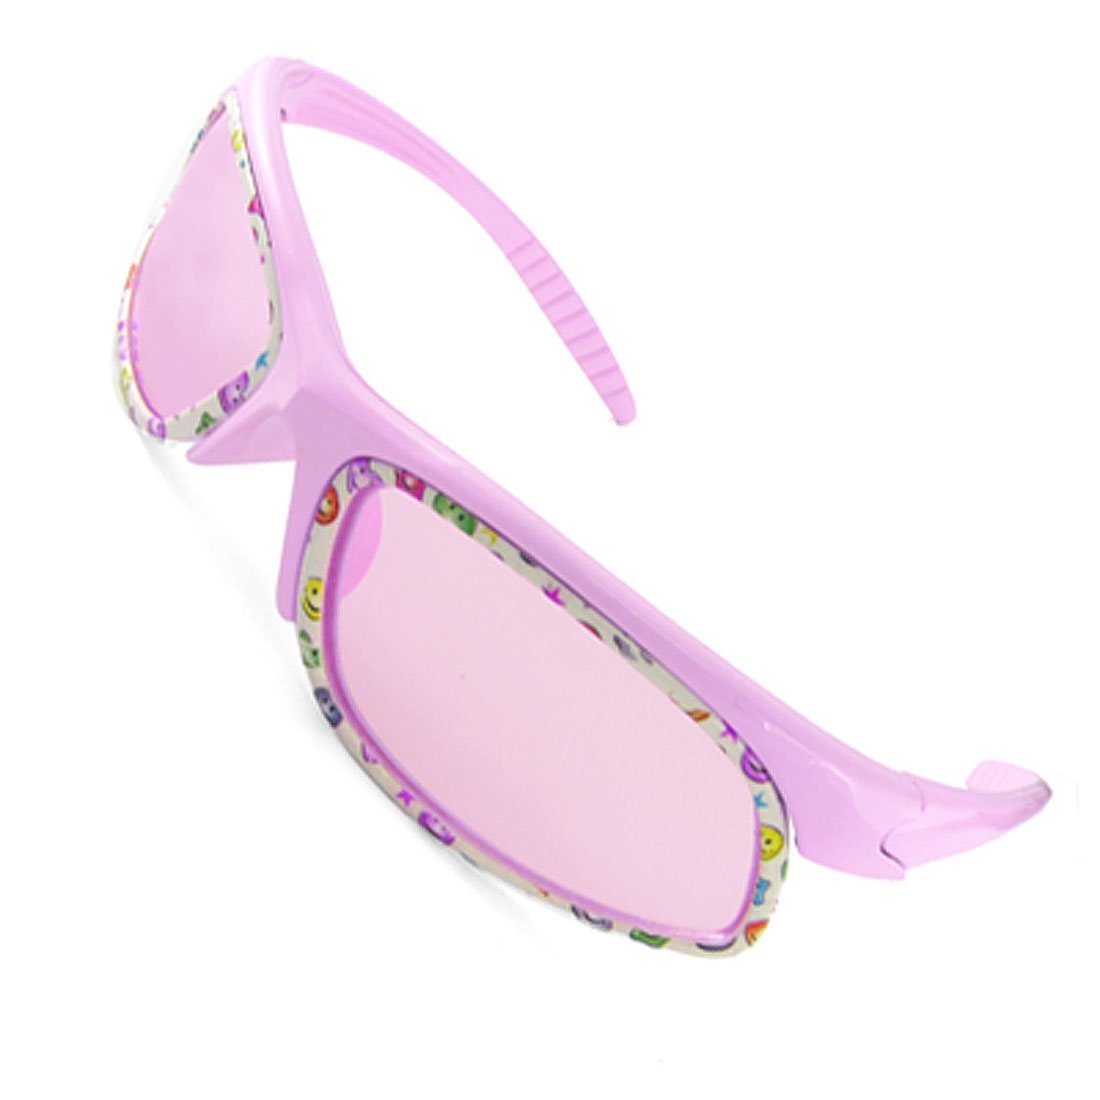 Children Smile Face Plastic Frame Outdoor Sunglasses Pink